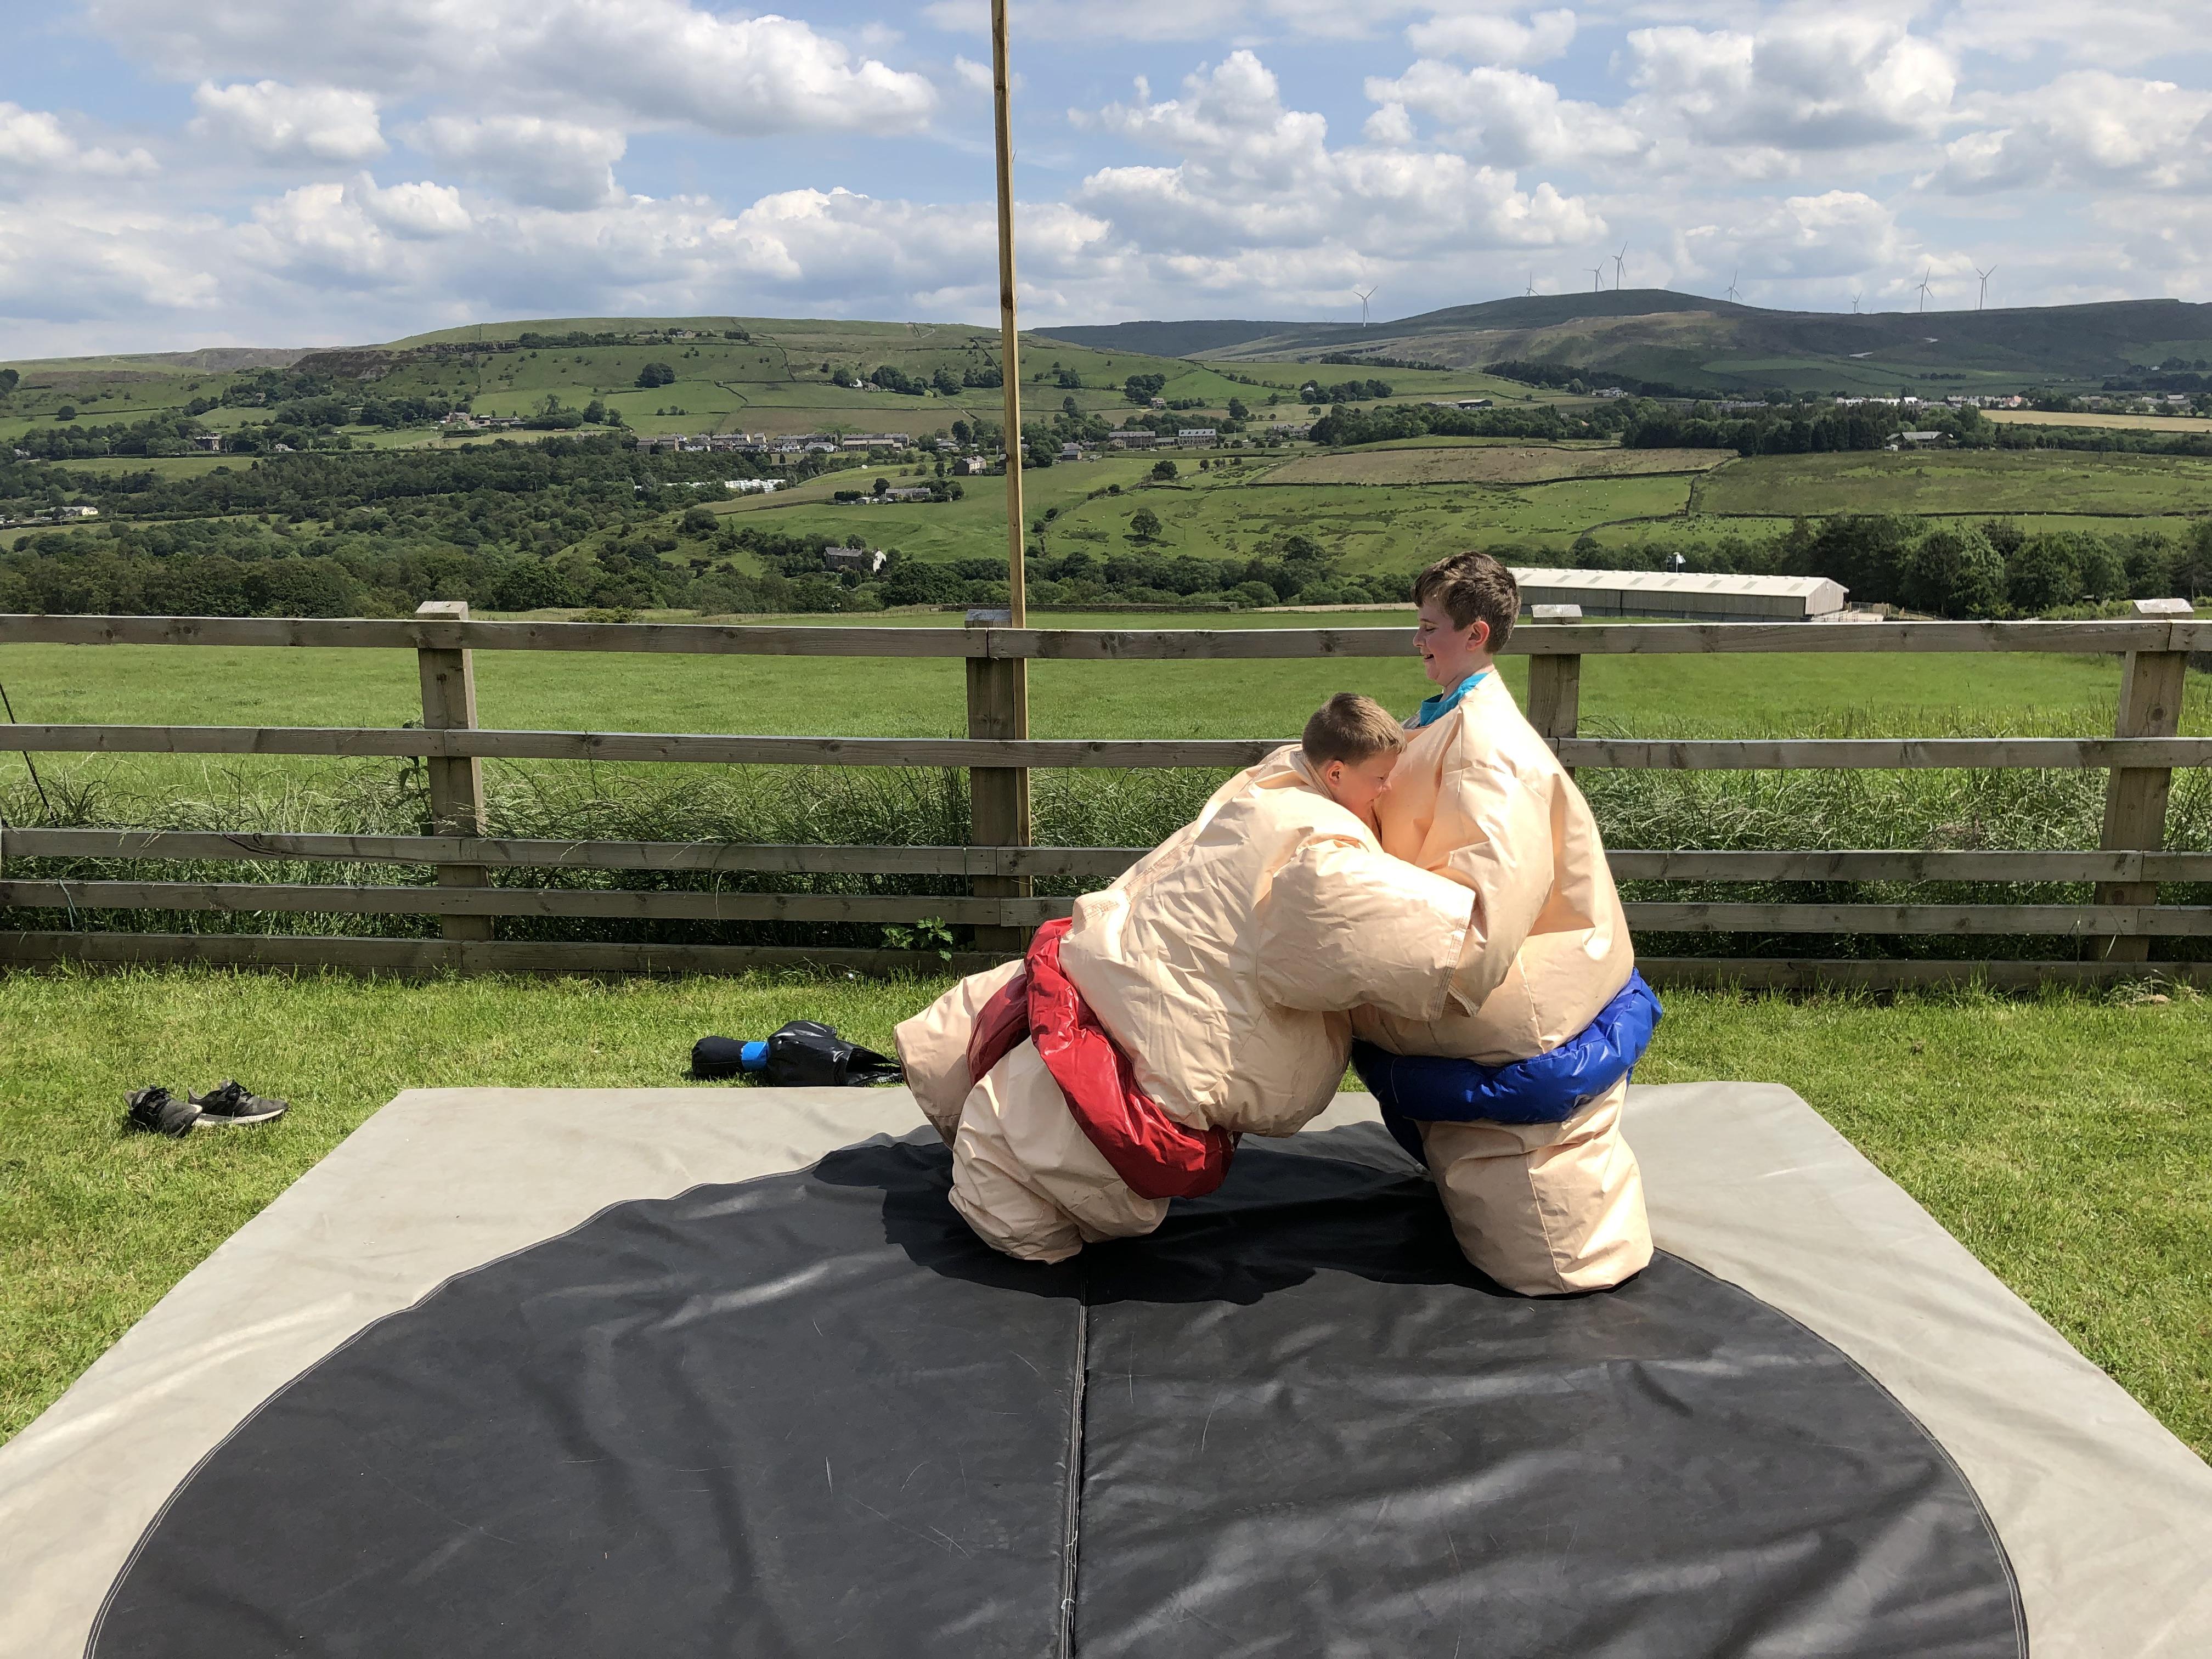 Kids in sumo suits